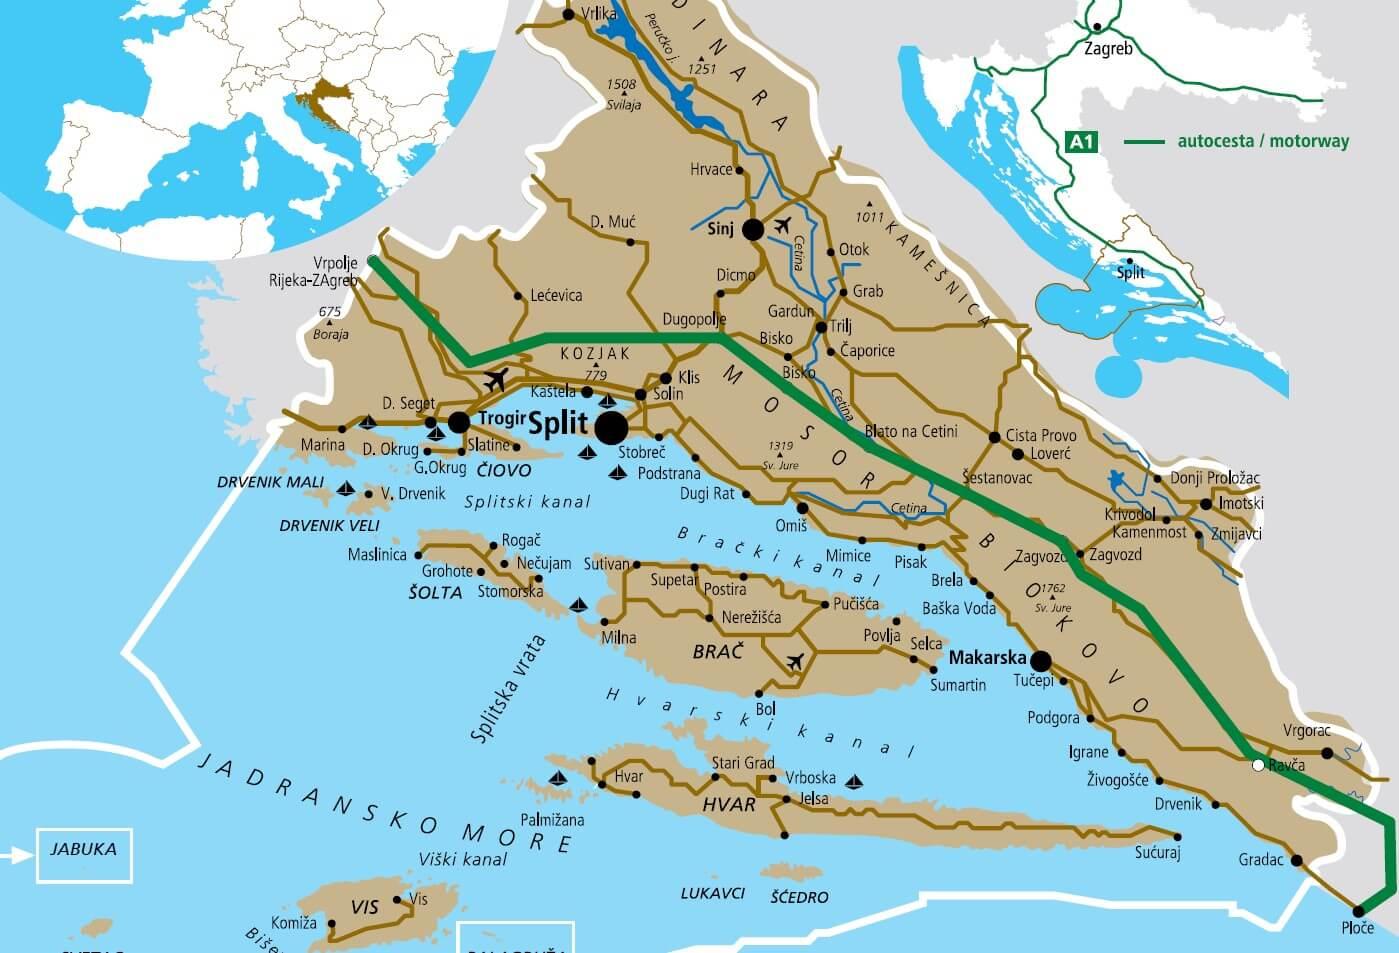 Carte Croatie Dalmatie Centrale.Dalmatie Centrale La Region De Split Hvar Et Makarska